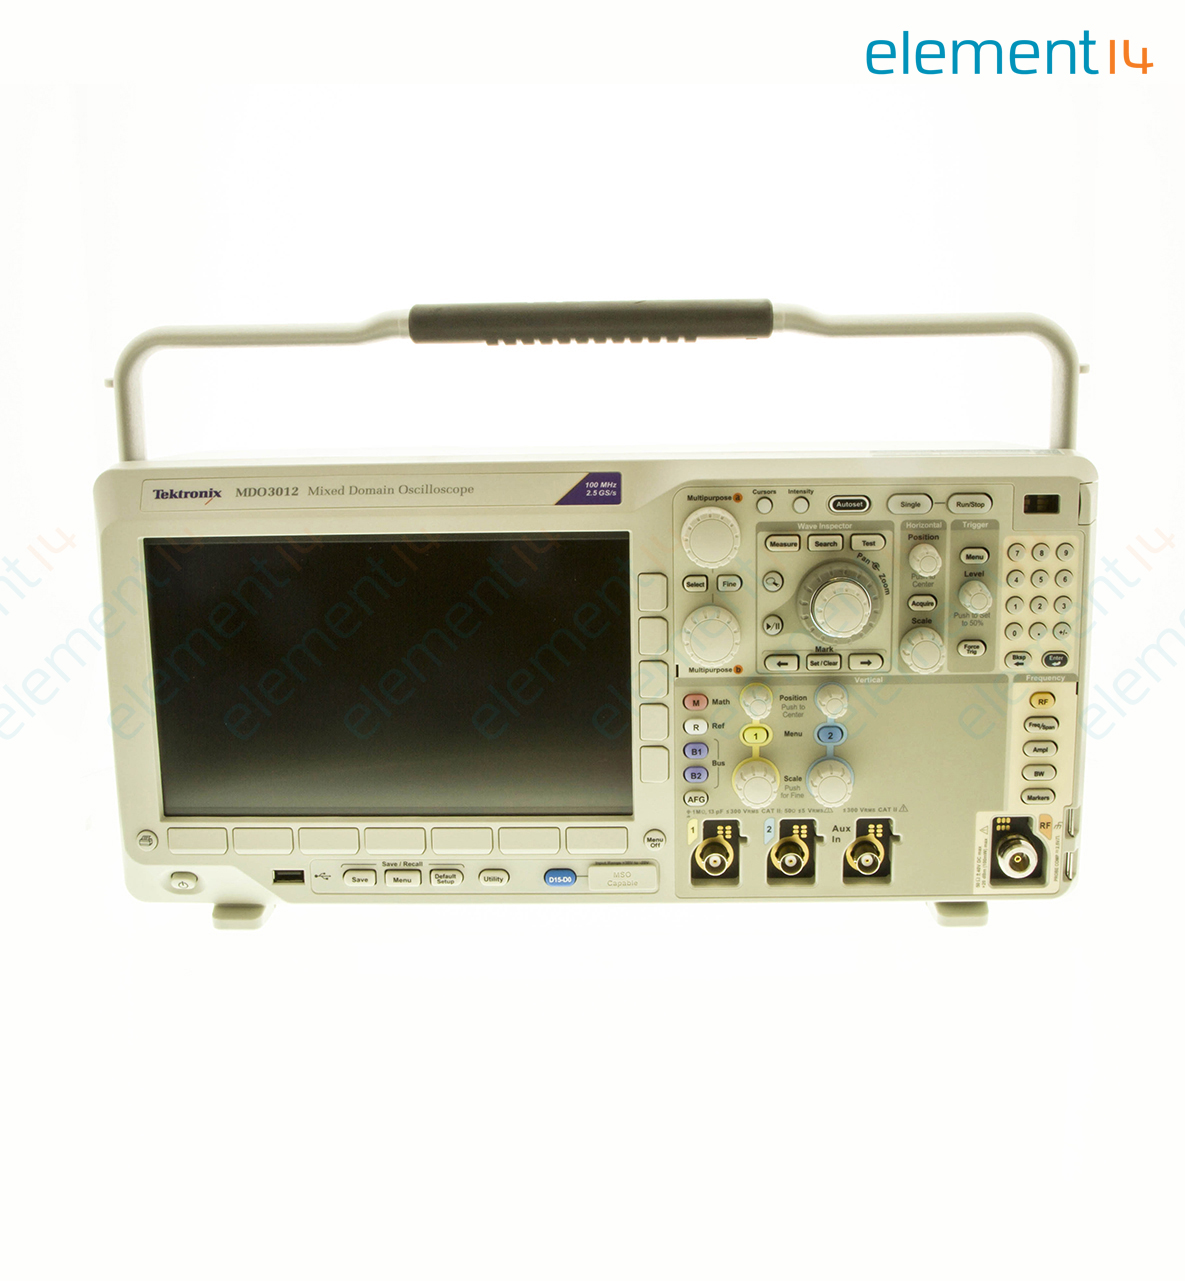 Mdo3012 Tektronix Oscilloscope Mdo3000 Series 2 Channel Tahmid39s Blog Ac Power Control With Thyristor Pulse Skipping Using Richmedia 350kb En